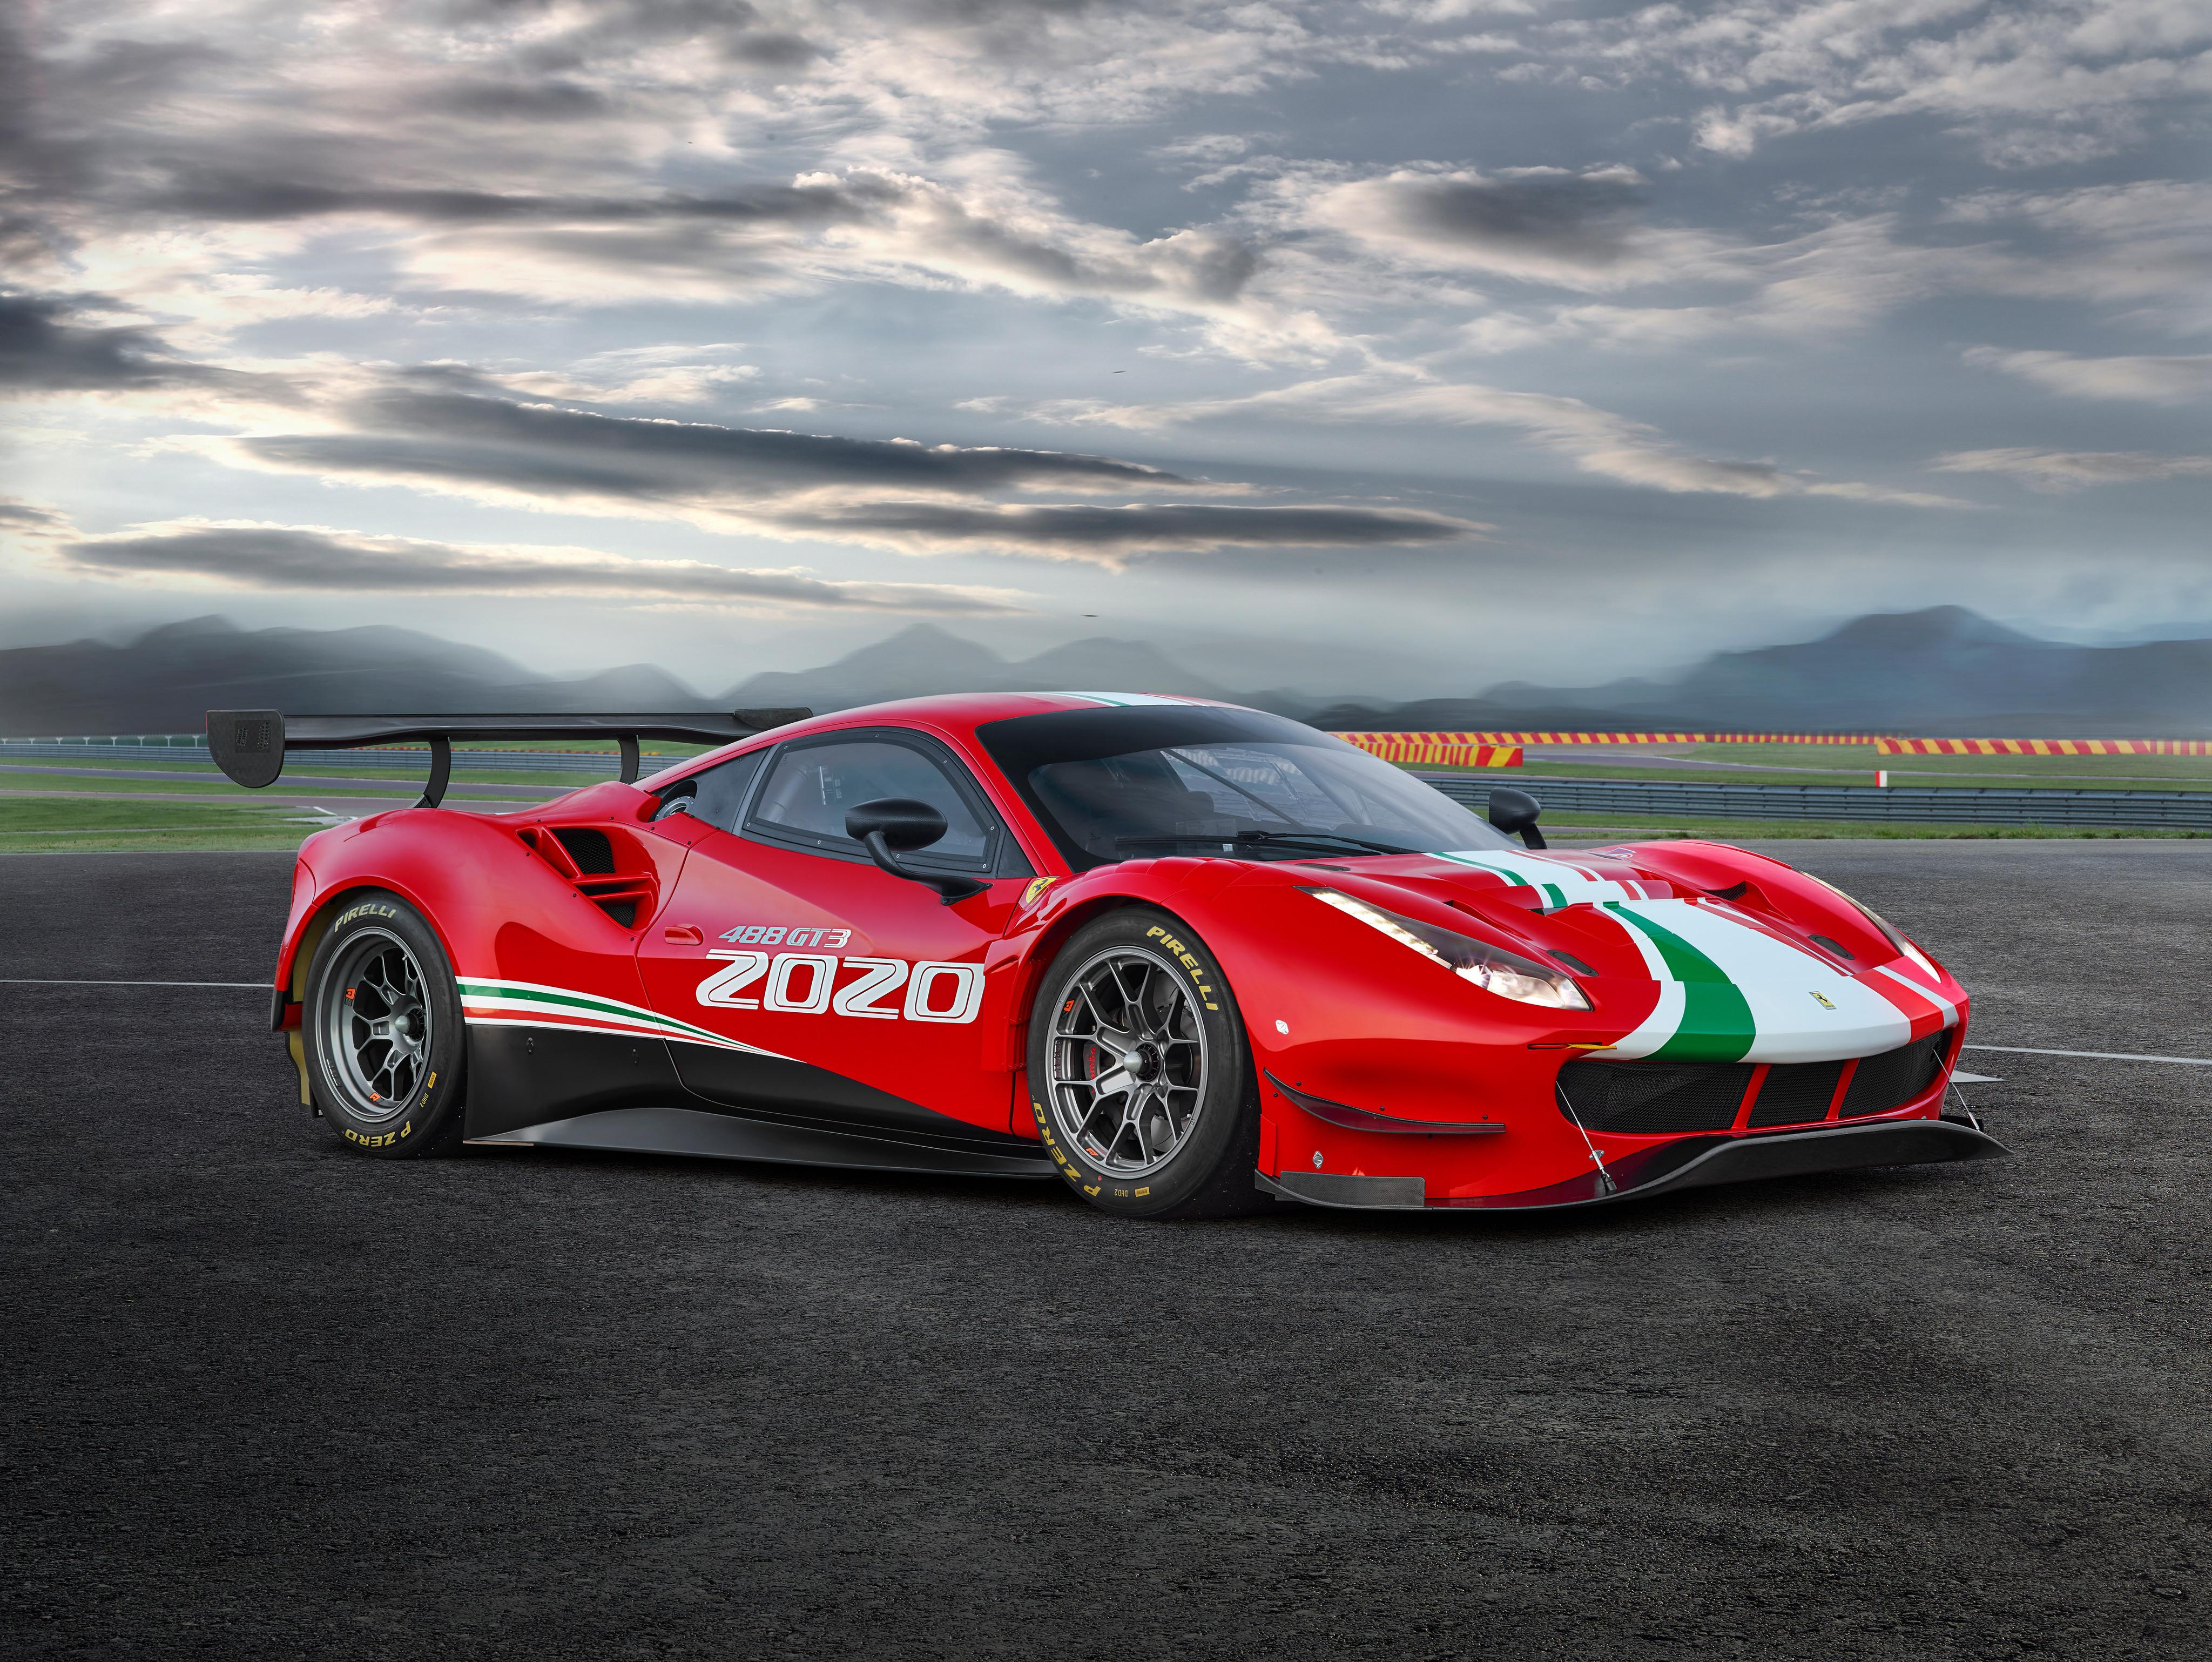 Ferrari 488 Challenge Evo Race Car Wallpapers - Wallpaper Cave